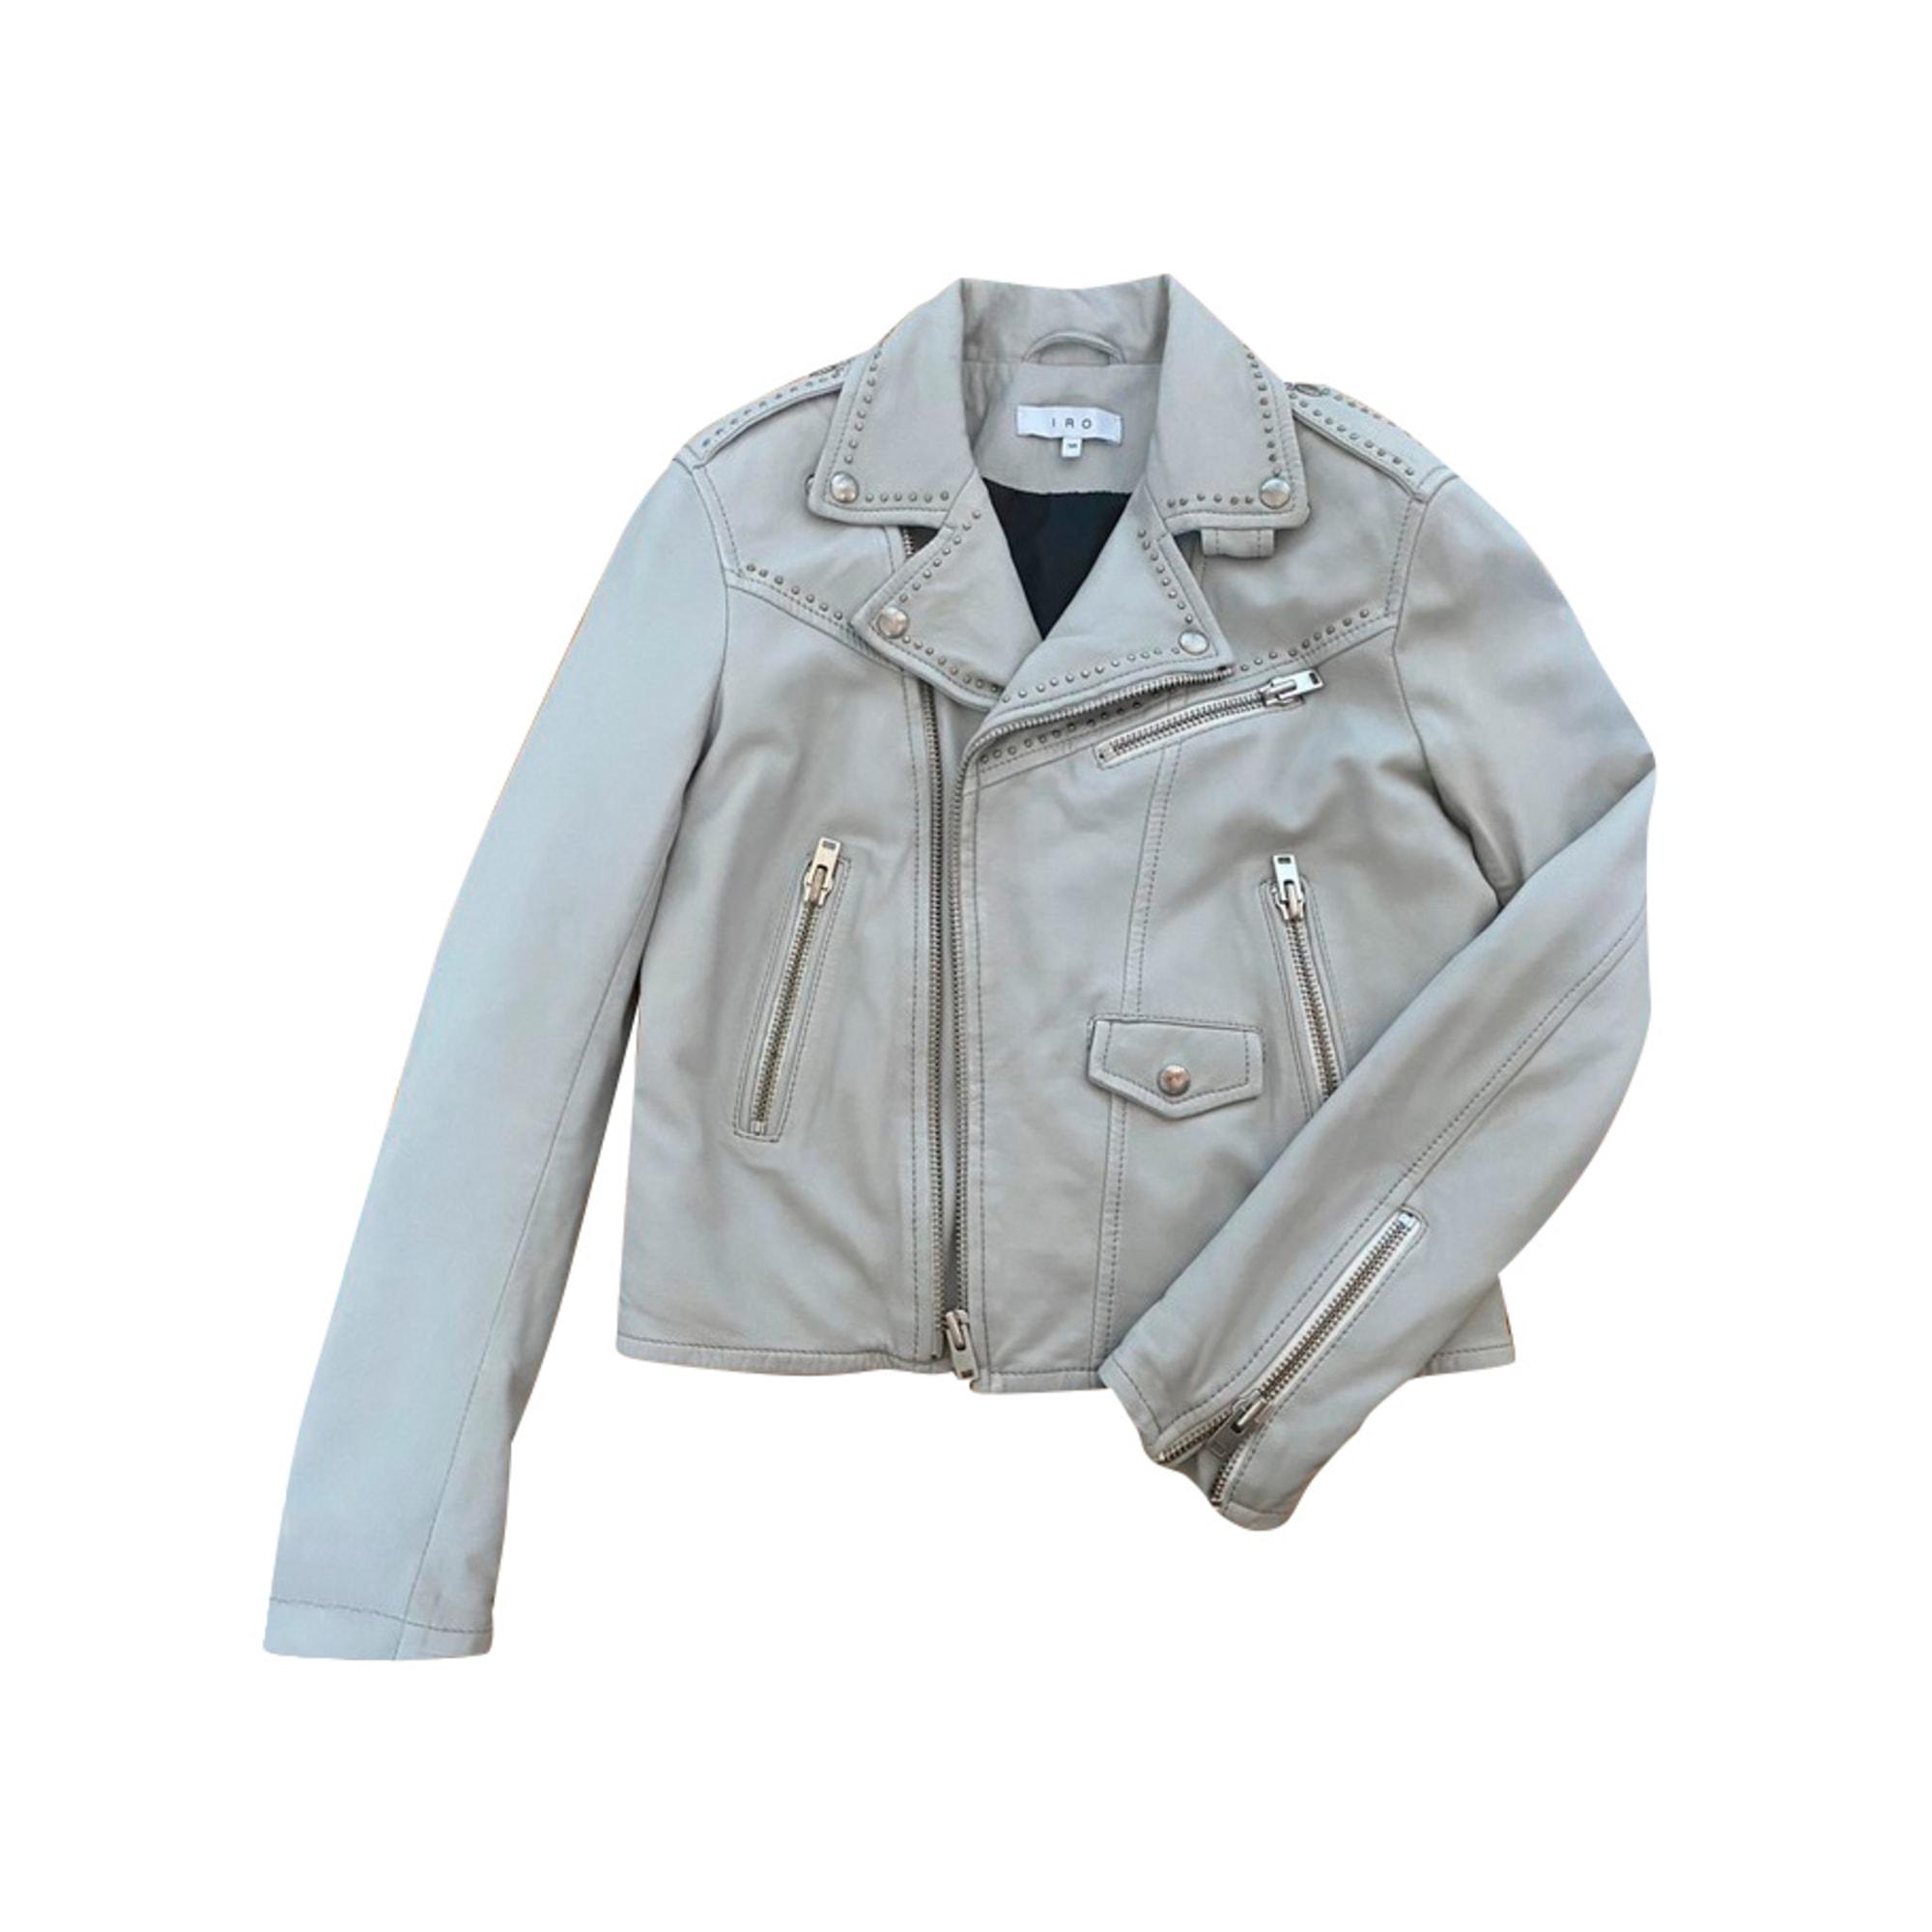 Zipped Jacket IRO Gray, charcoal